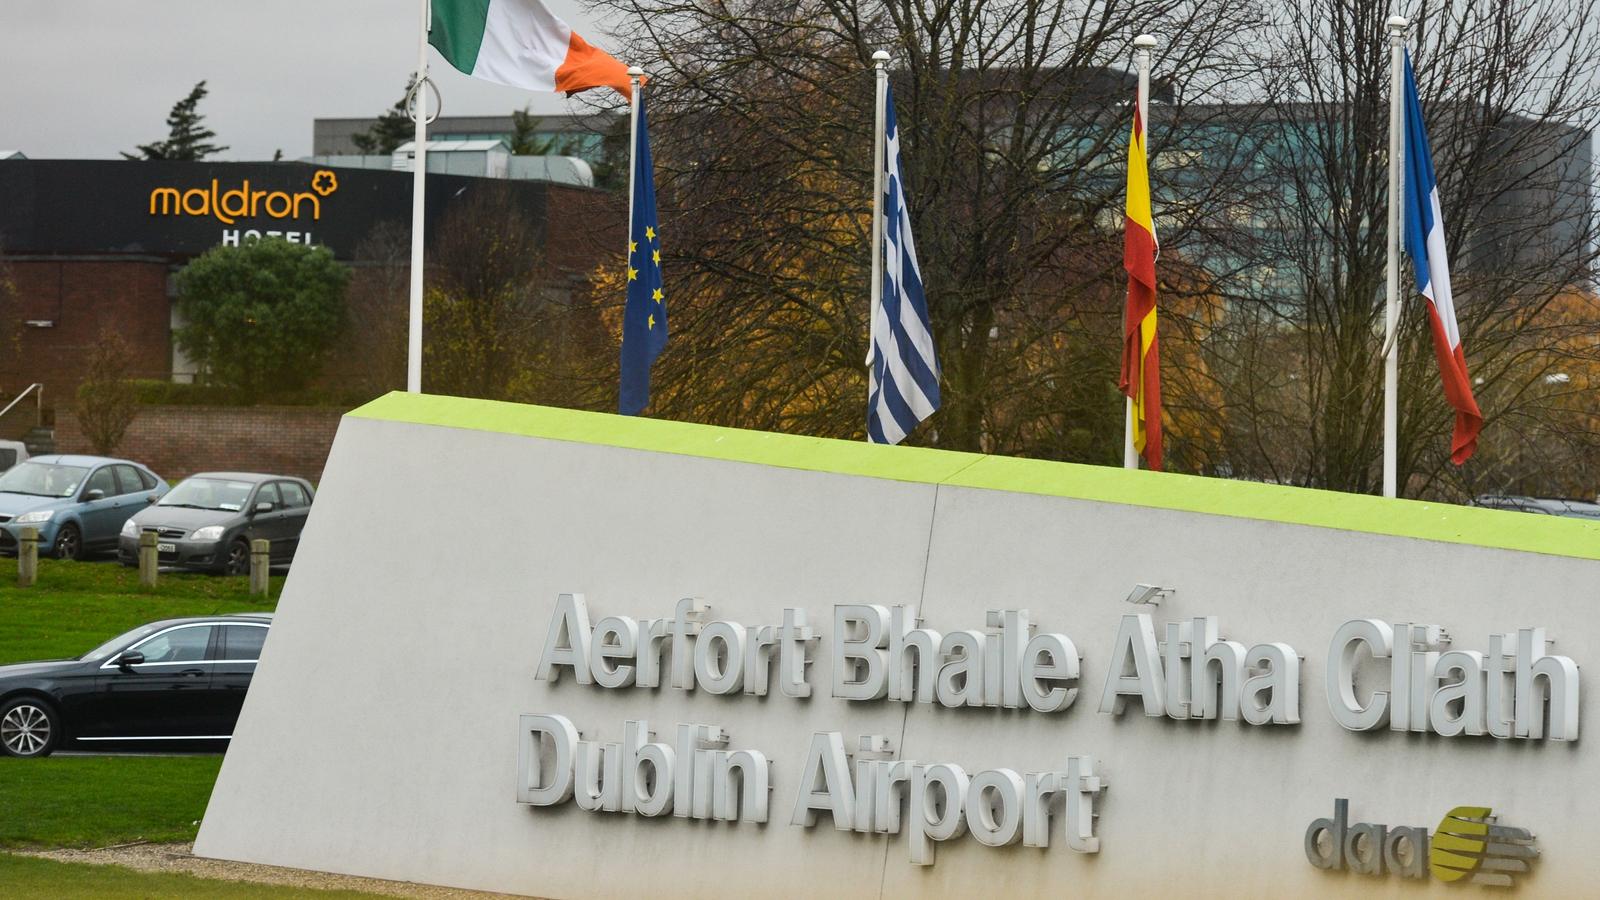 Woman loses €60,000 damages claim against Daa